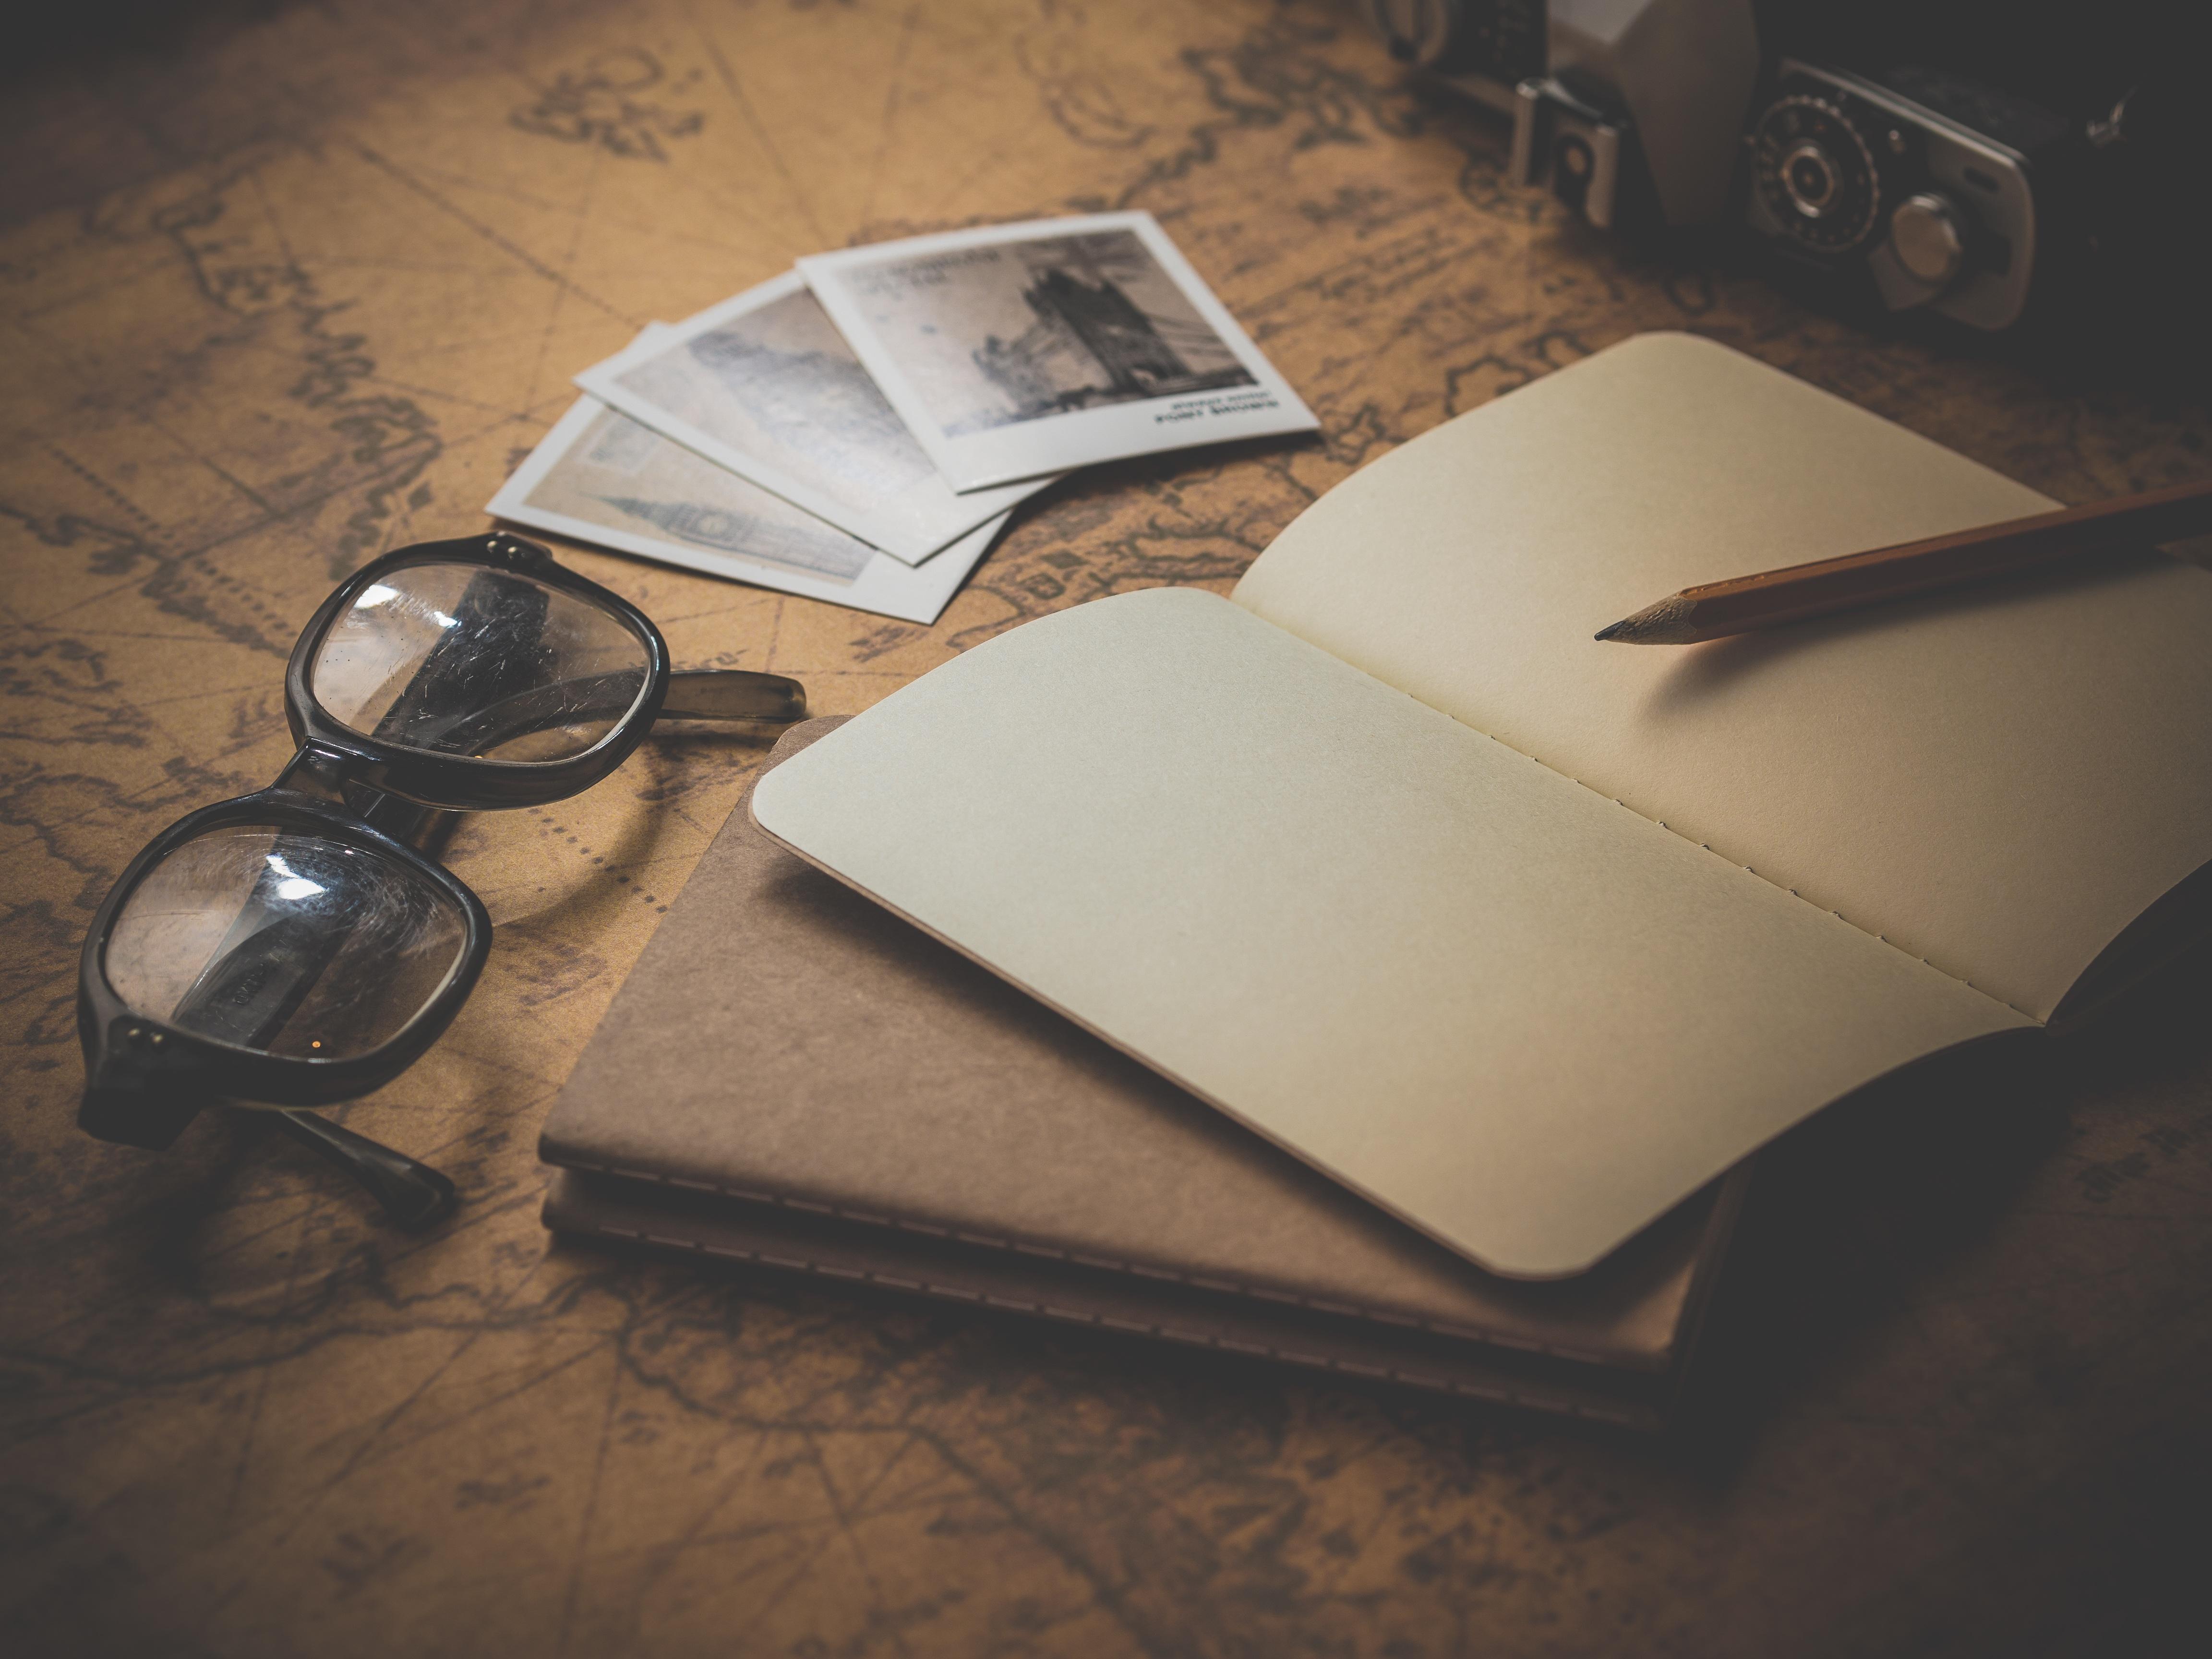 blog-senhorita-deise-frases-inspiradoras-12